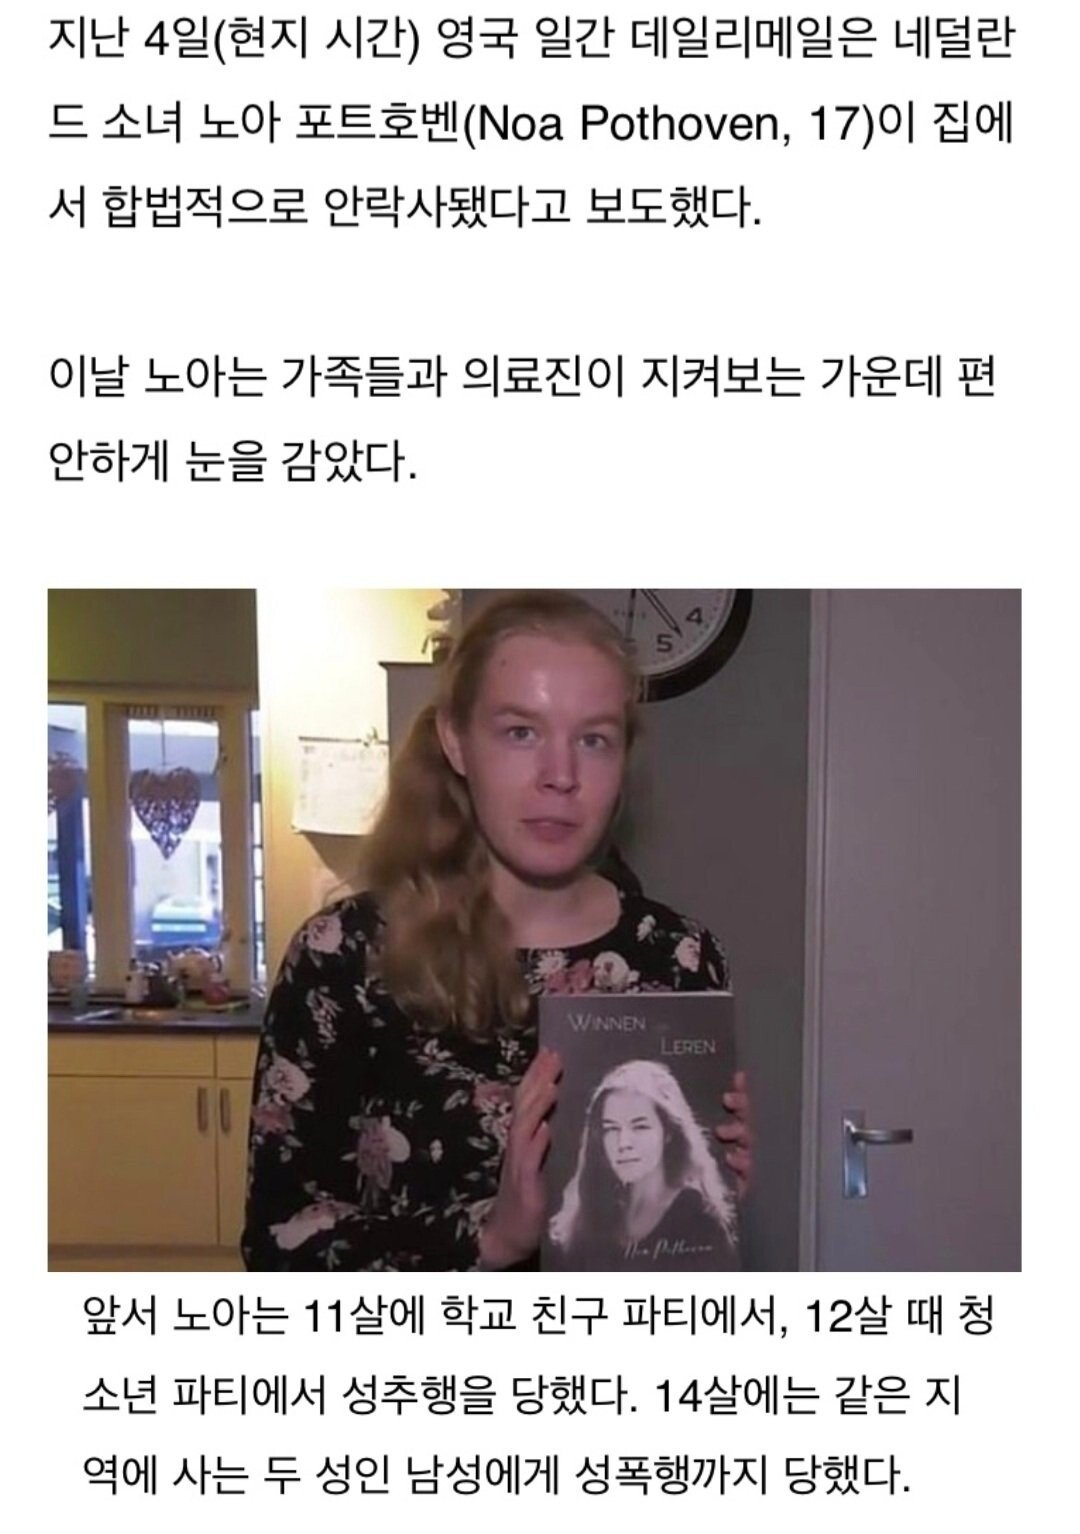 Screenshot_20210919-080433_NAVER.jpg 스스로 안락사를 선택한 17살 네덜란드 소녀